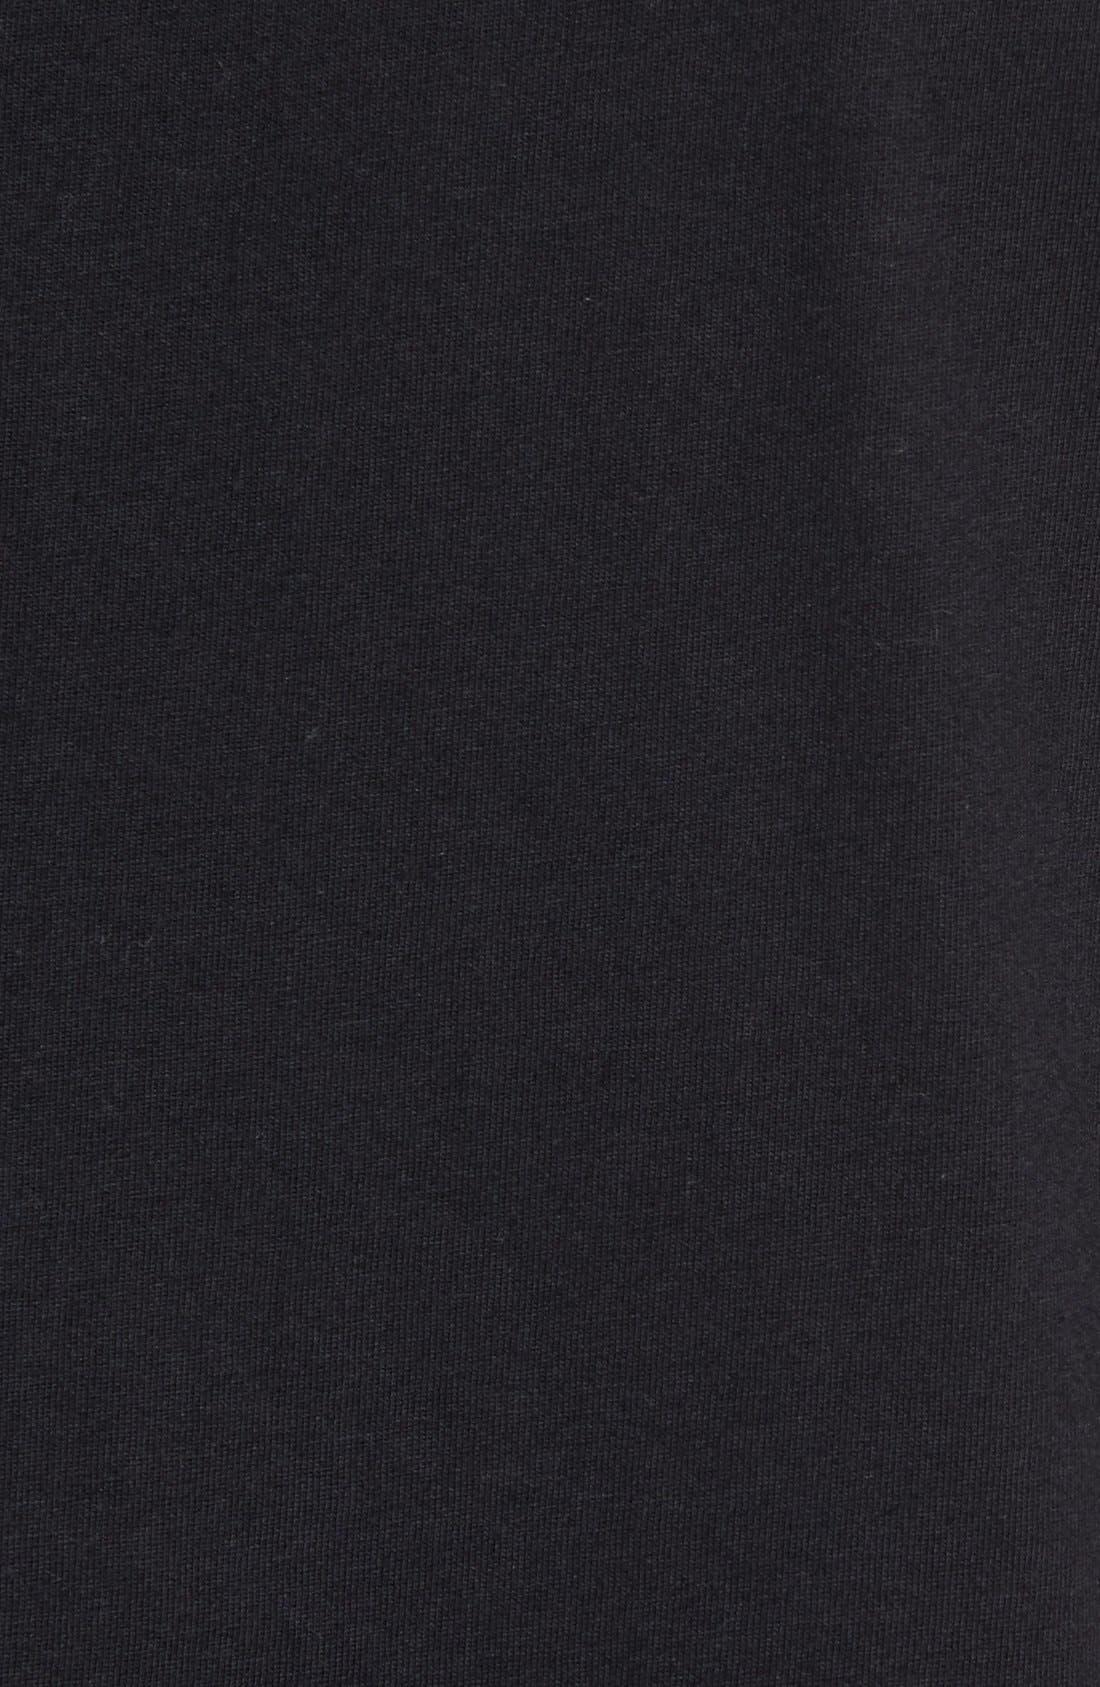 Flintlock Longline T-Shirt,                             Alternate thumbnail 2, color,                             001